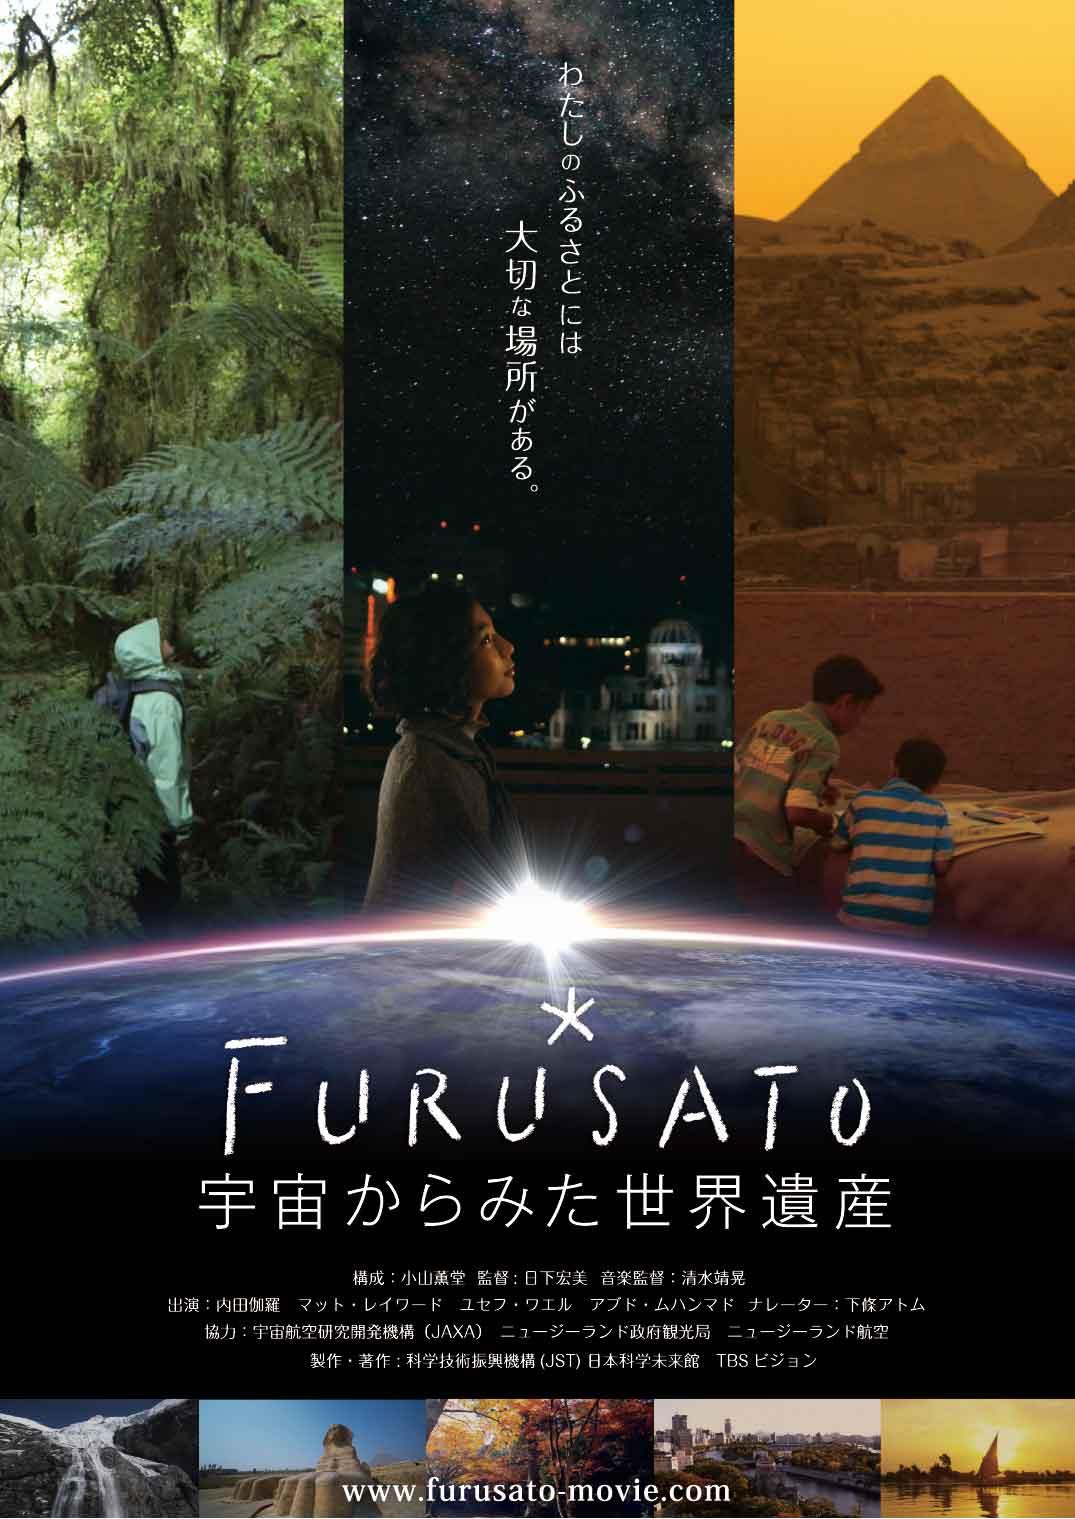 FURUSATO 宇宙から見た世界遺産